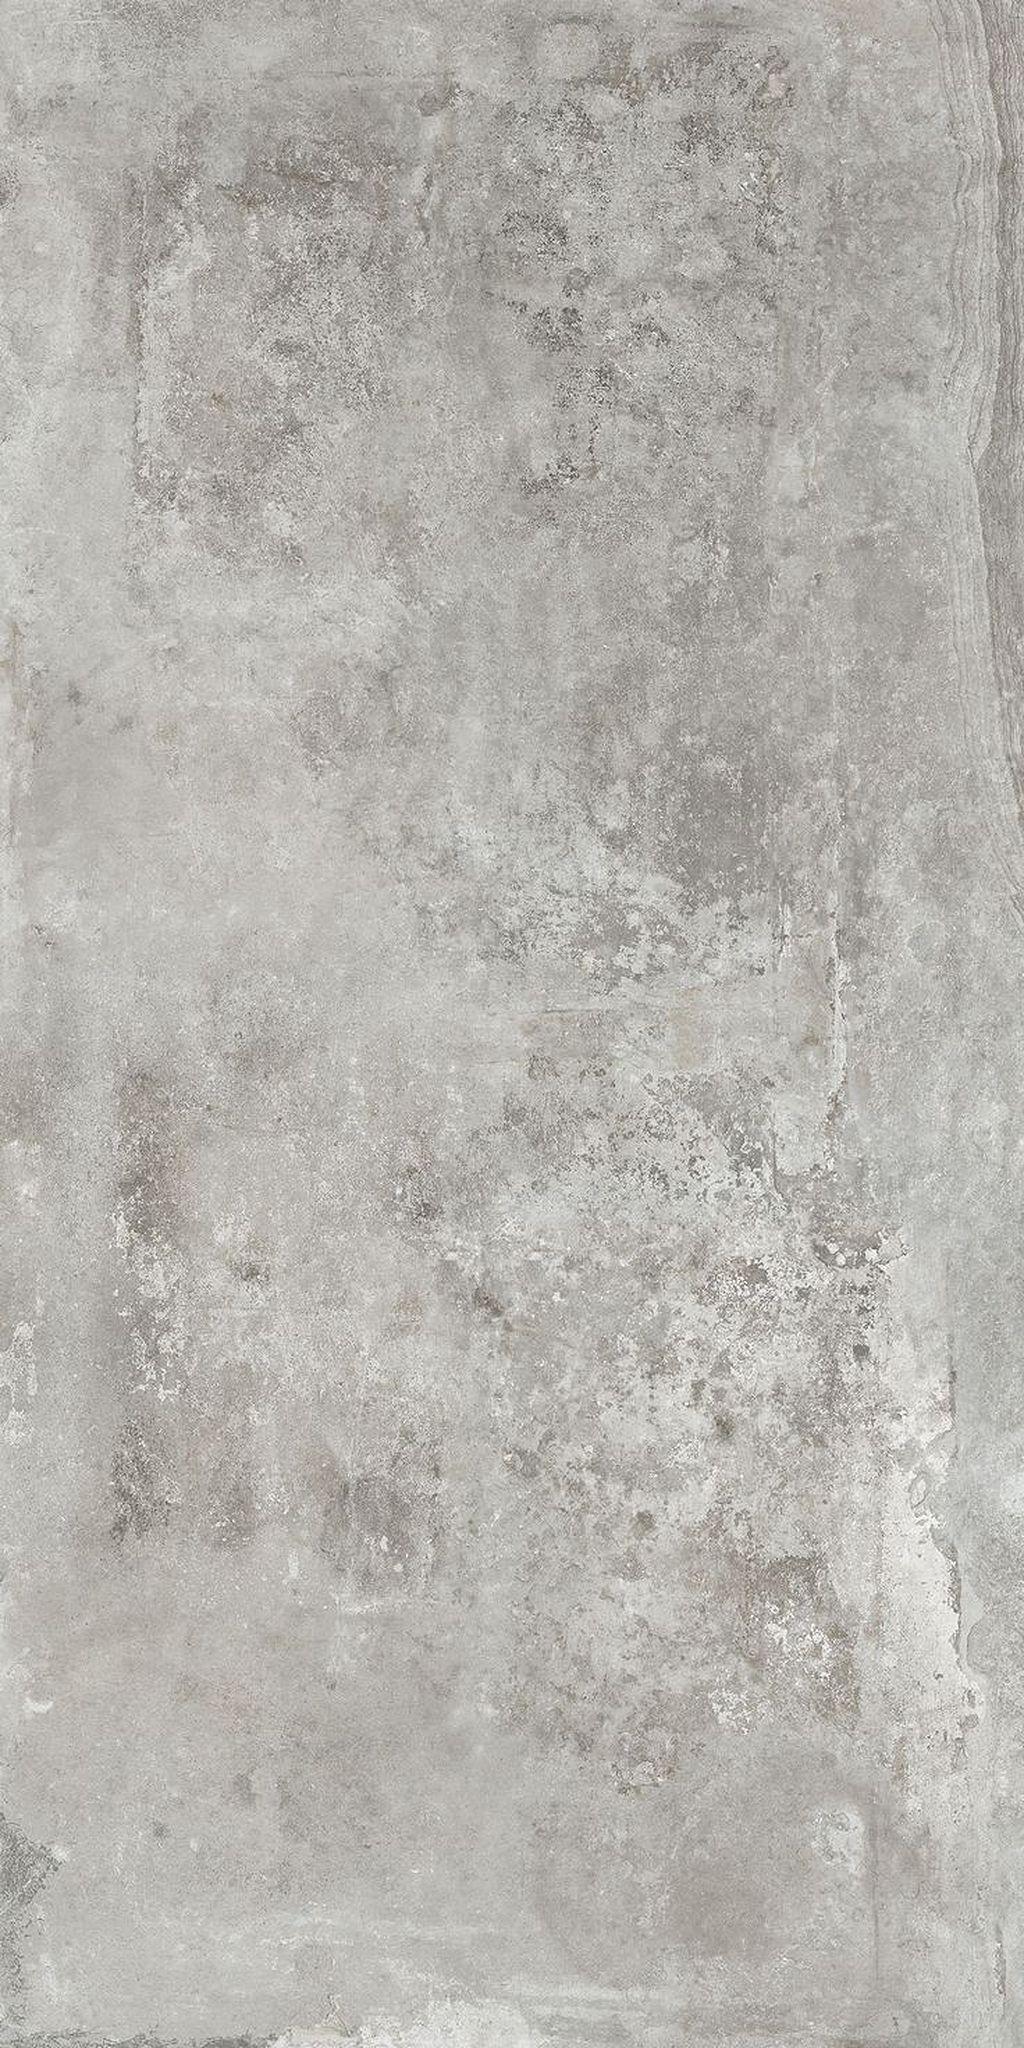 лофт бетон текстура